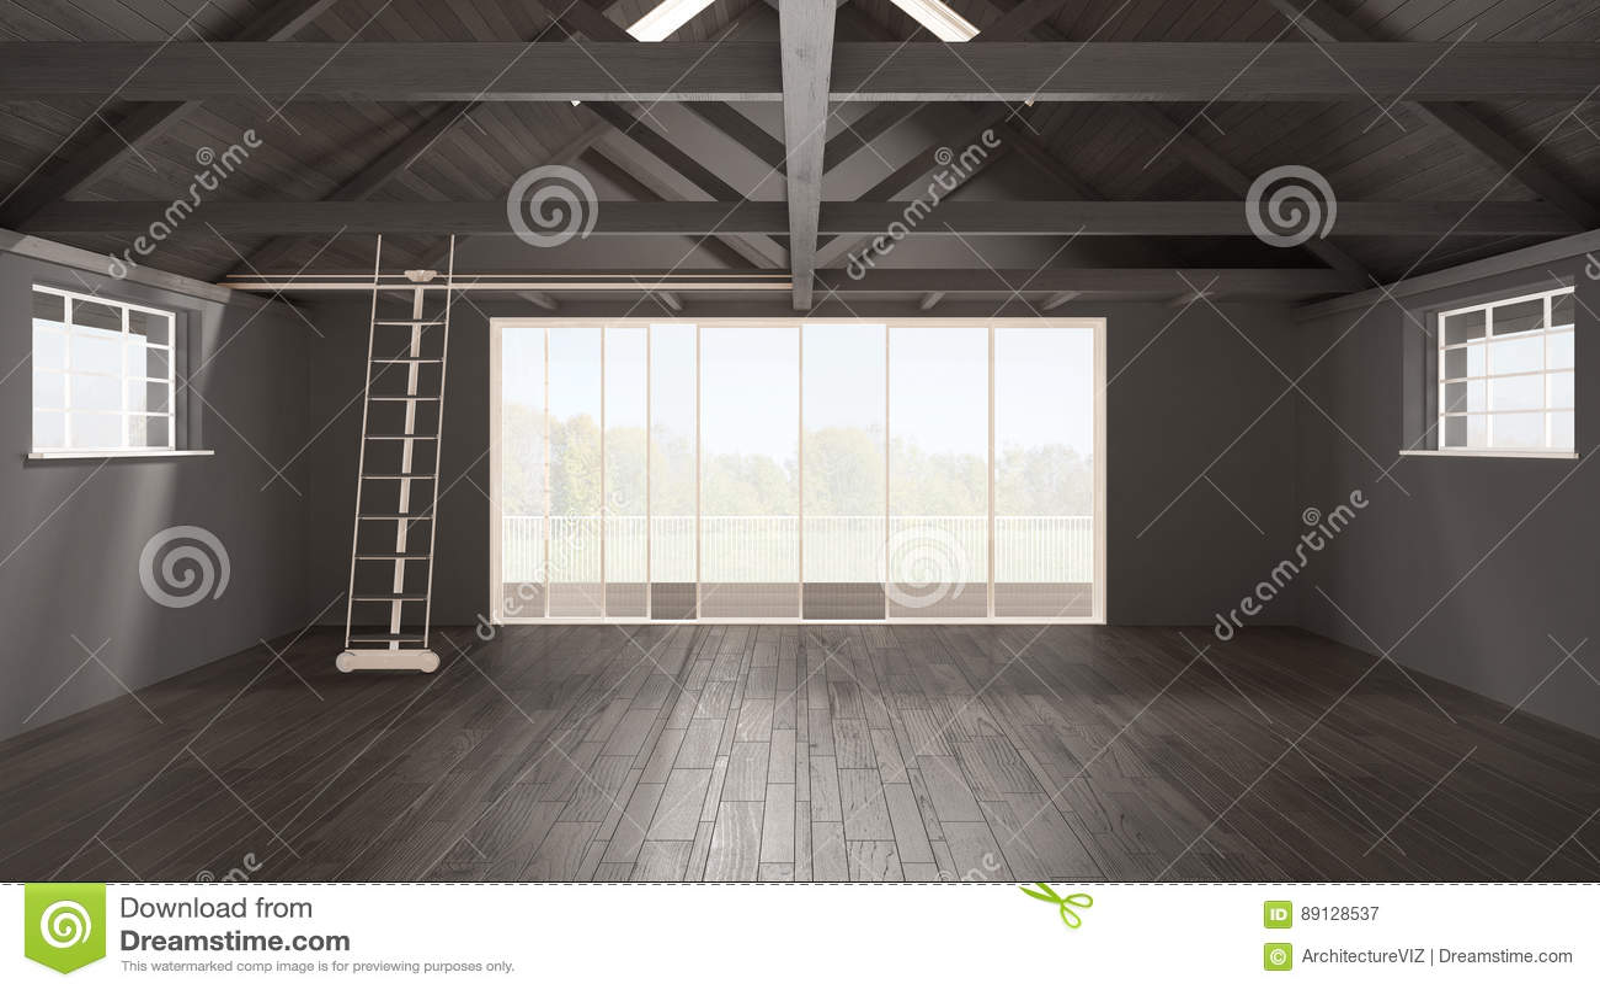 Minimalistische mezzanine zolder lege industriële ruimte houten